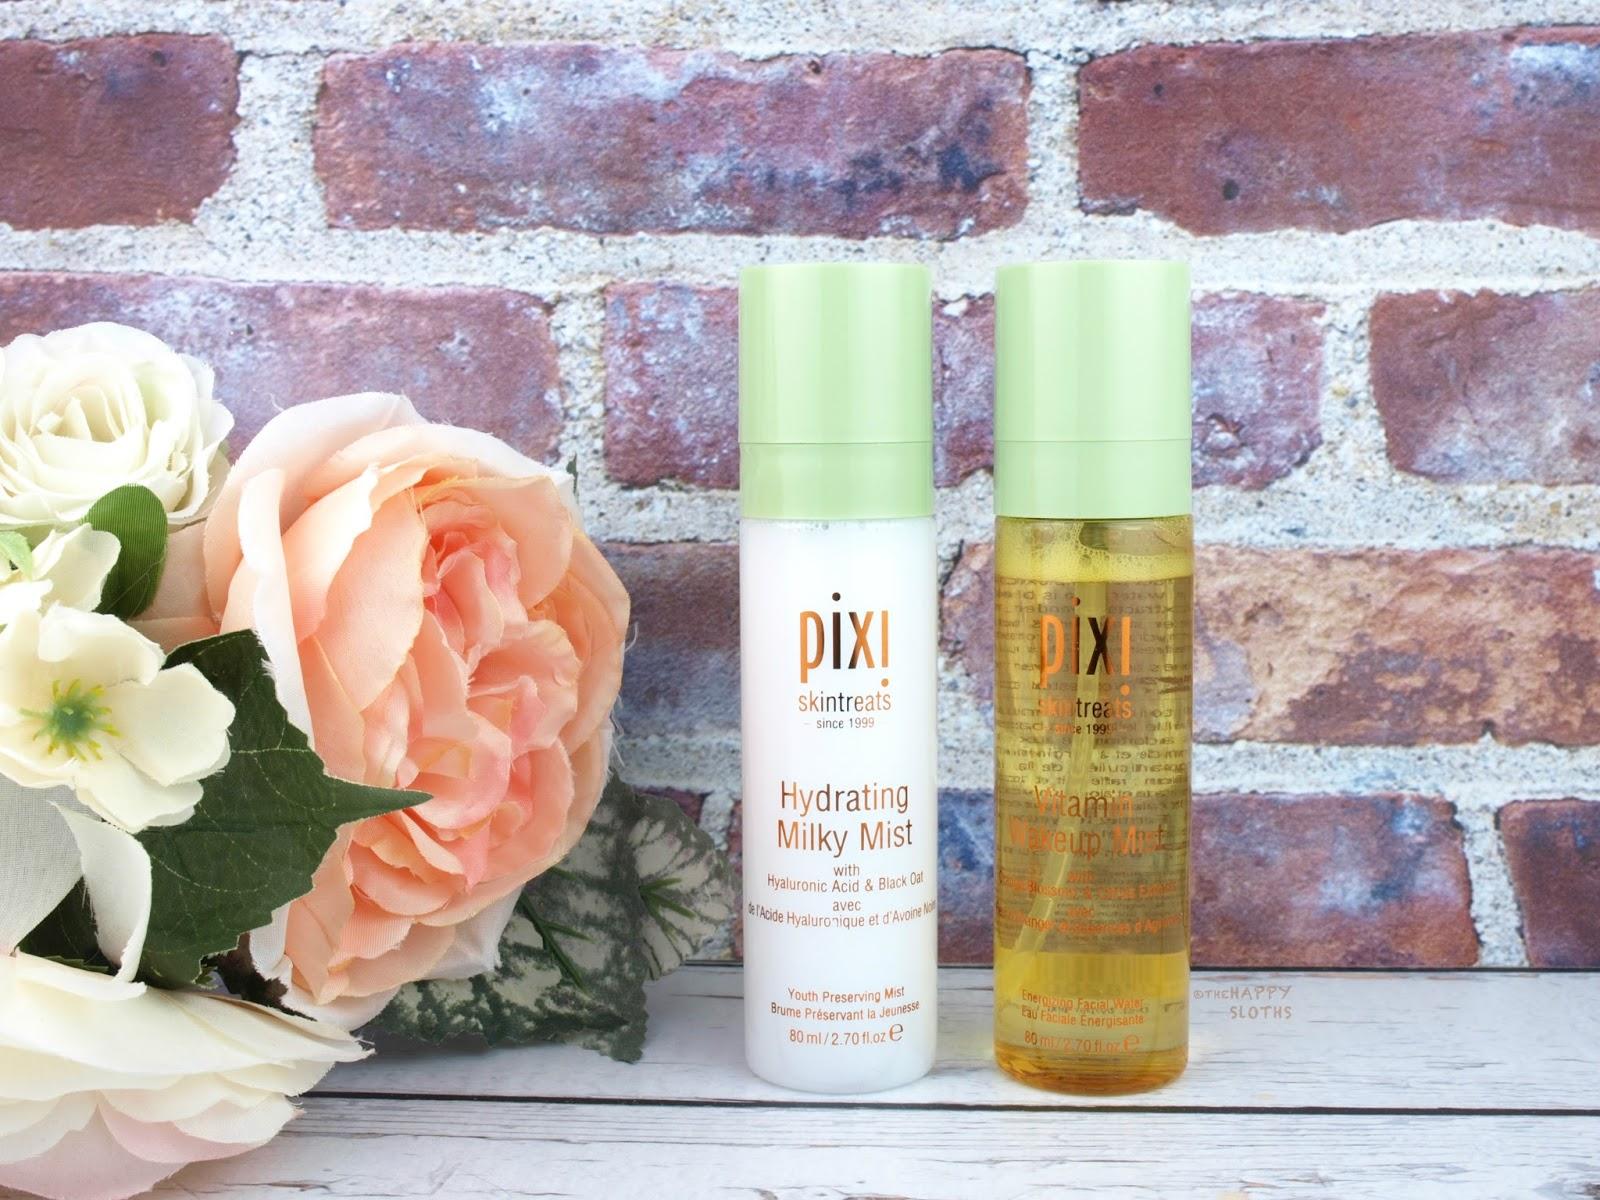 Pixi Skintreats | Hydrating Milky Mist & Vitamin Wakeup Mist: Review